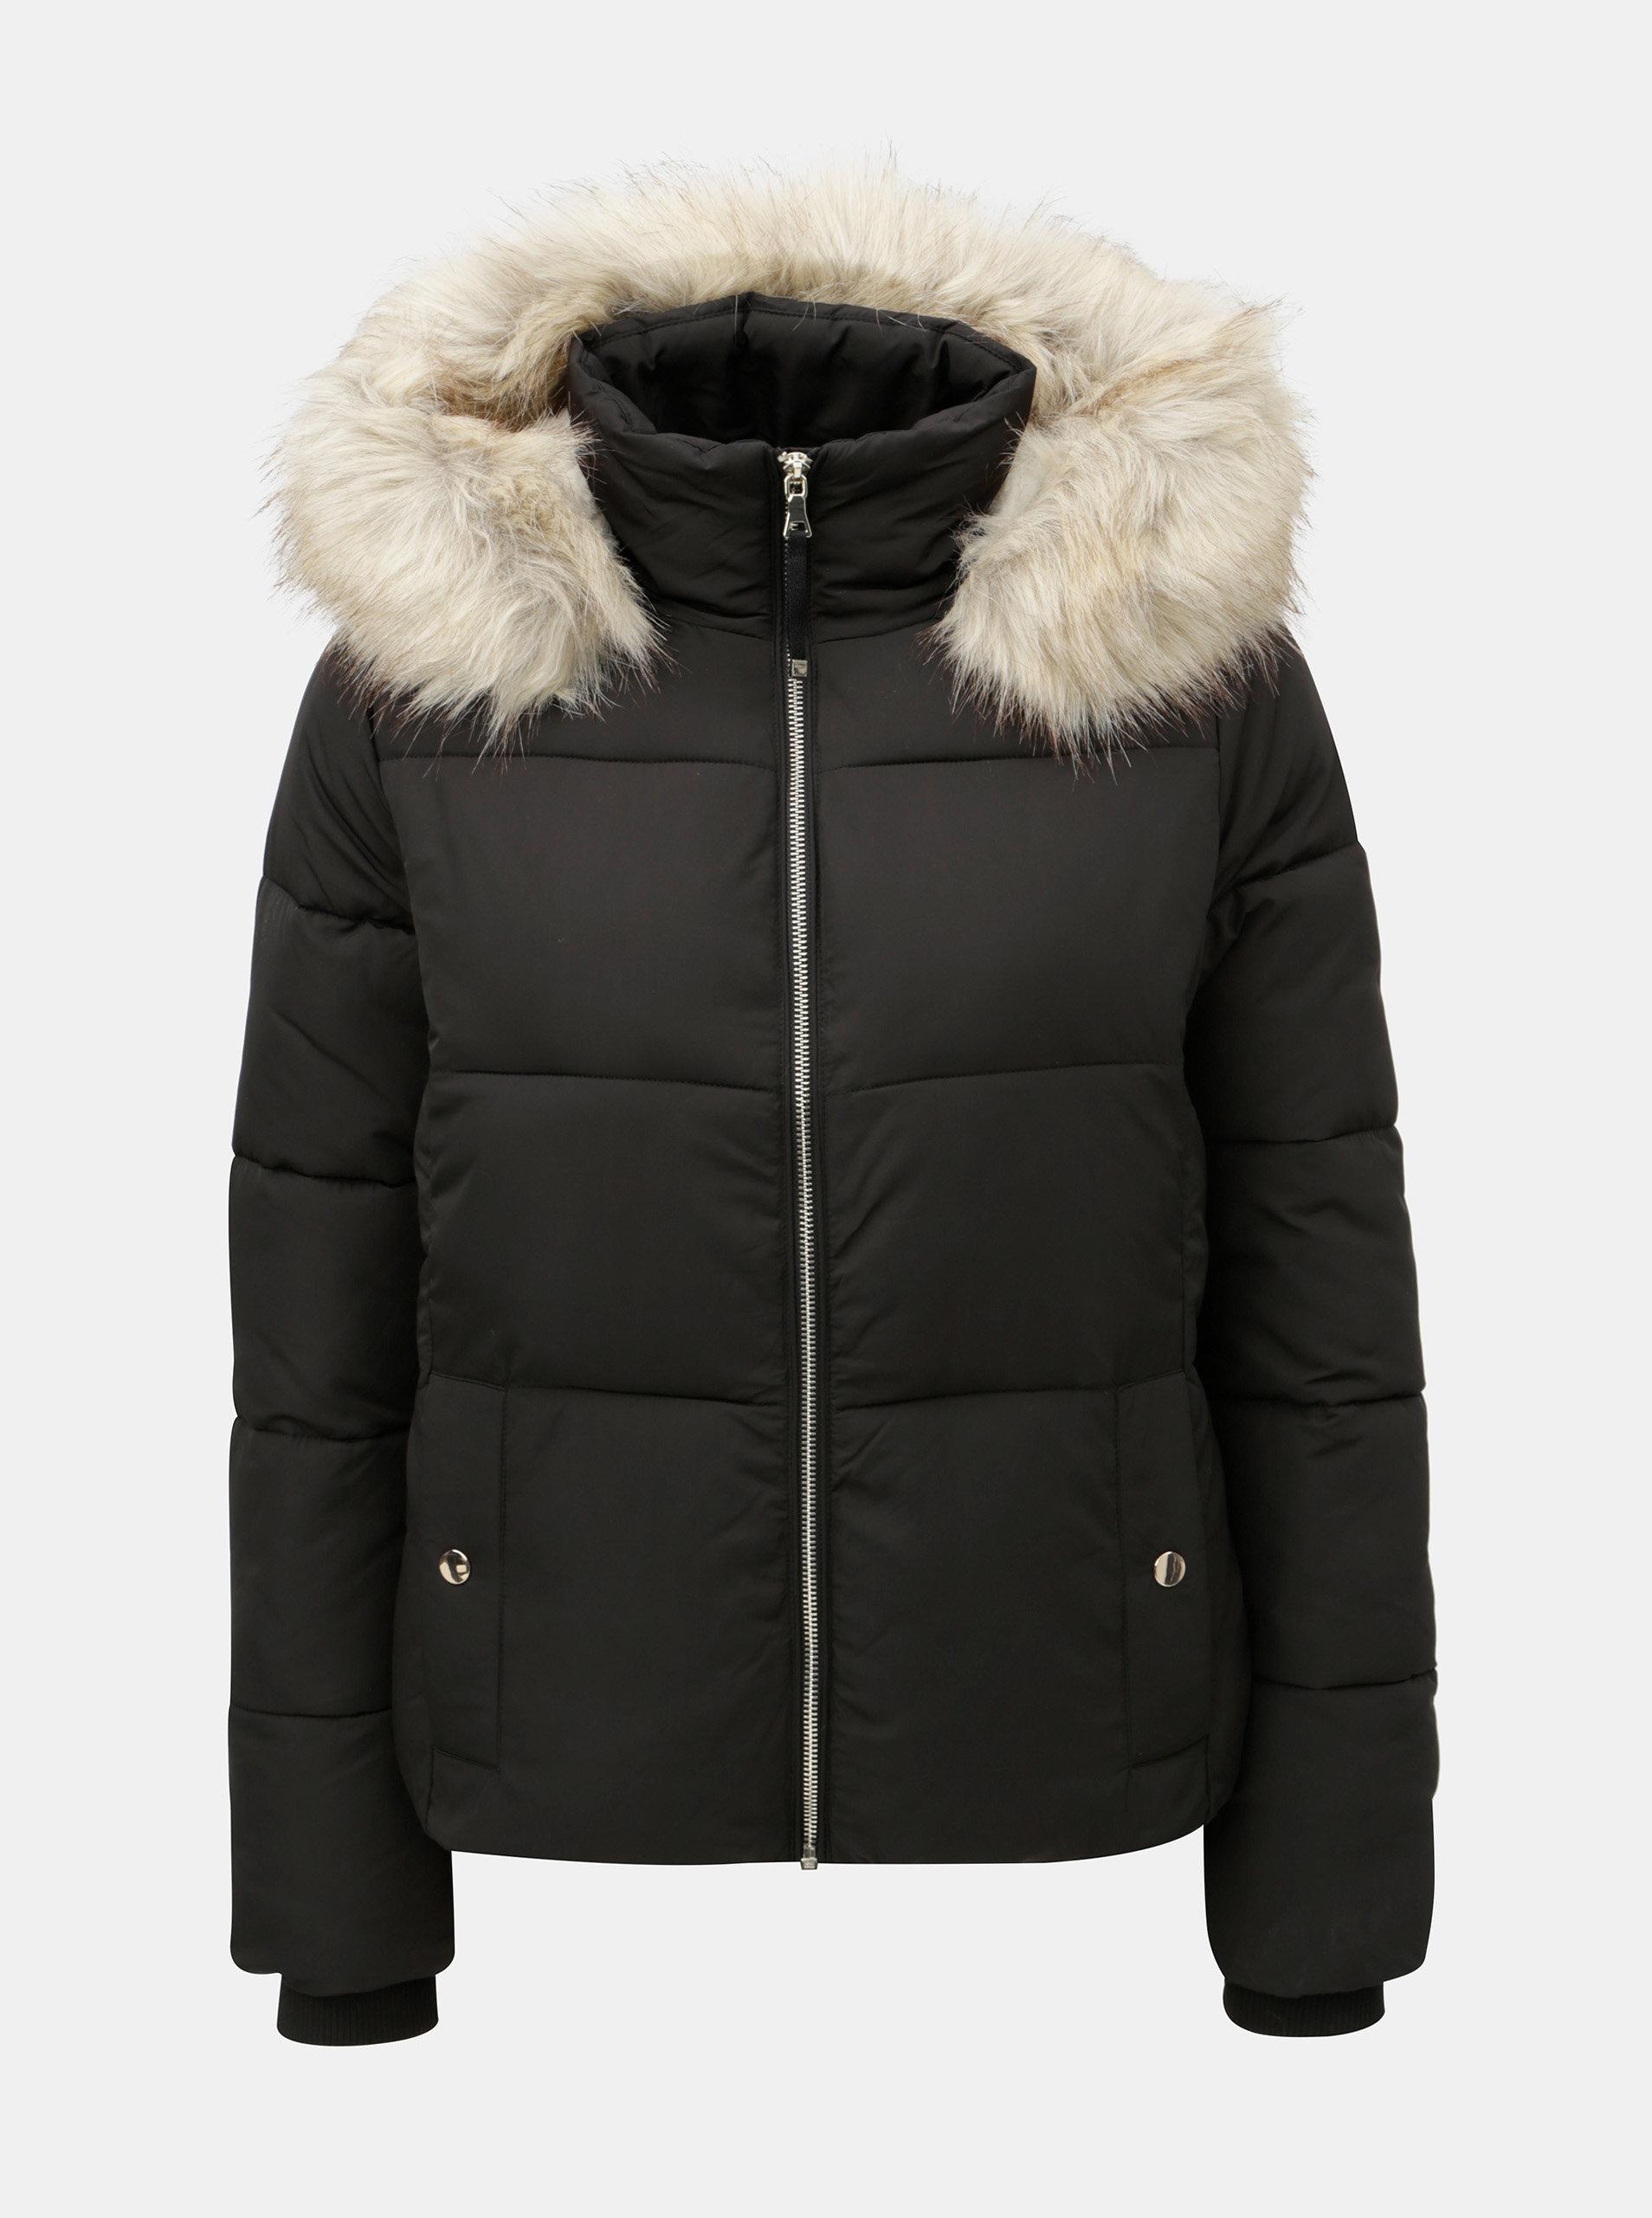 2ff6e0eed2d0 Čierna prešívaná zimná bunda s odnímateľnou umelou kožušinkou na kapucni Miss  Selfridge Puffer ...